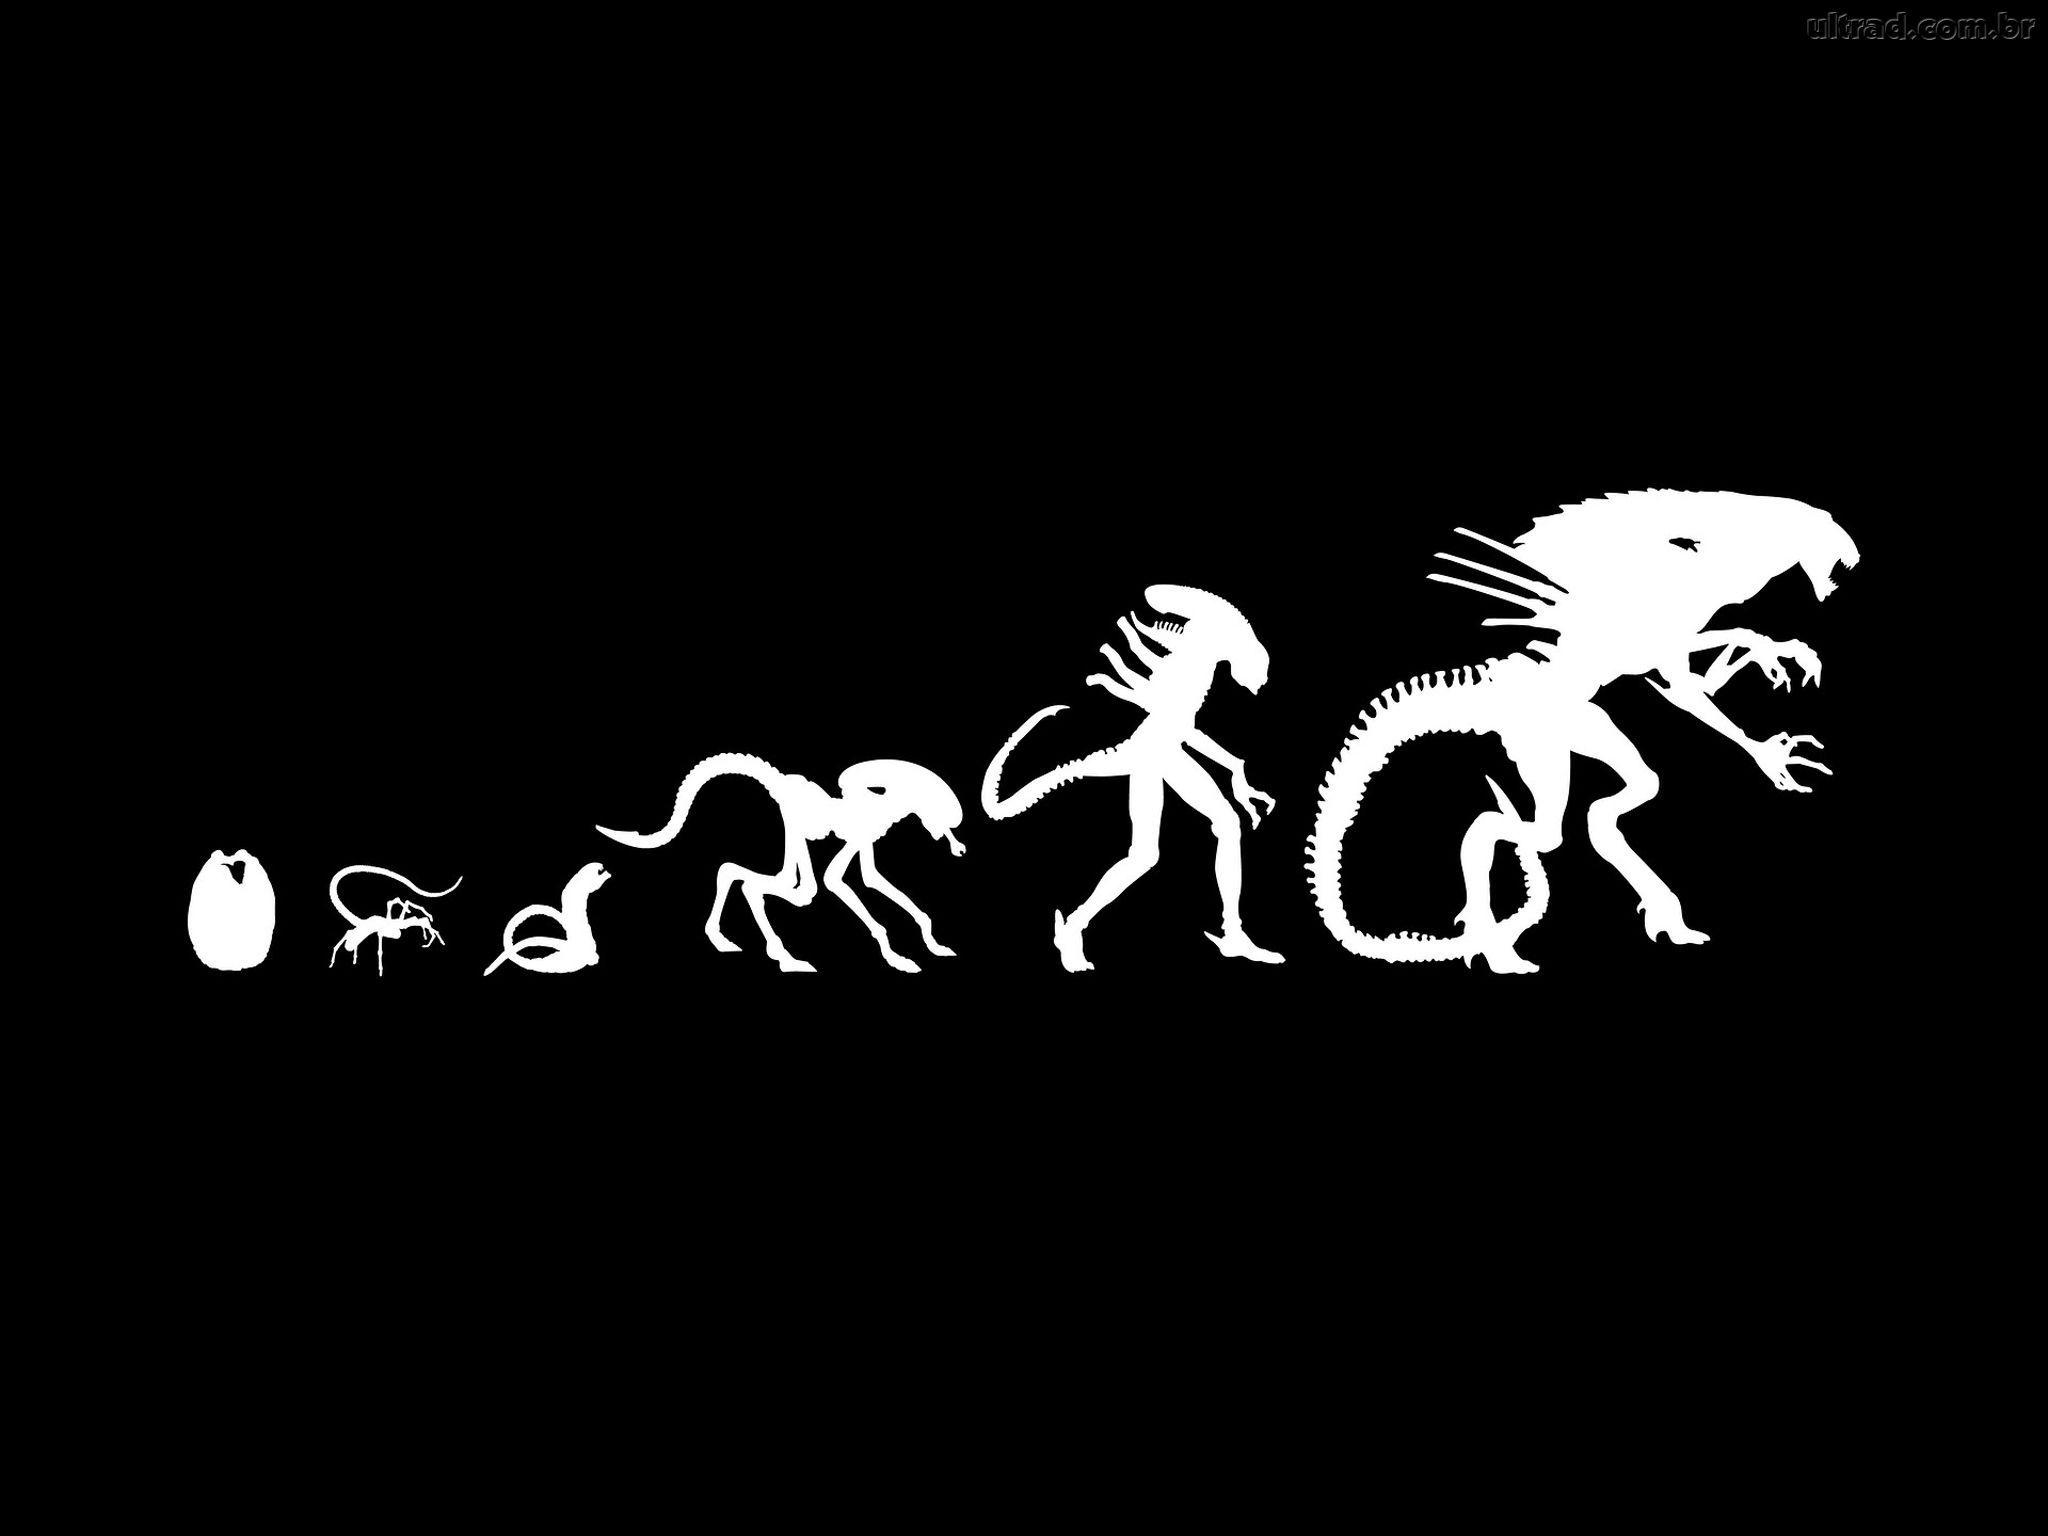 Alien xenomorph evolution  | Cinema | Alien concept art